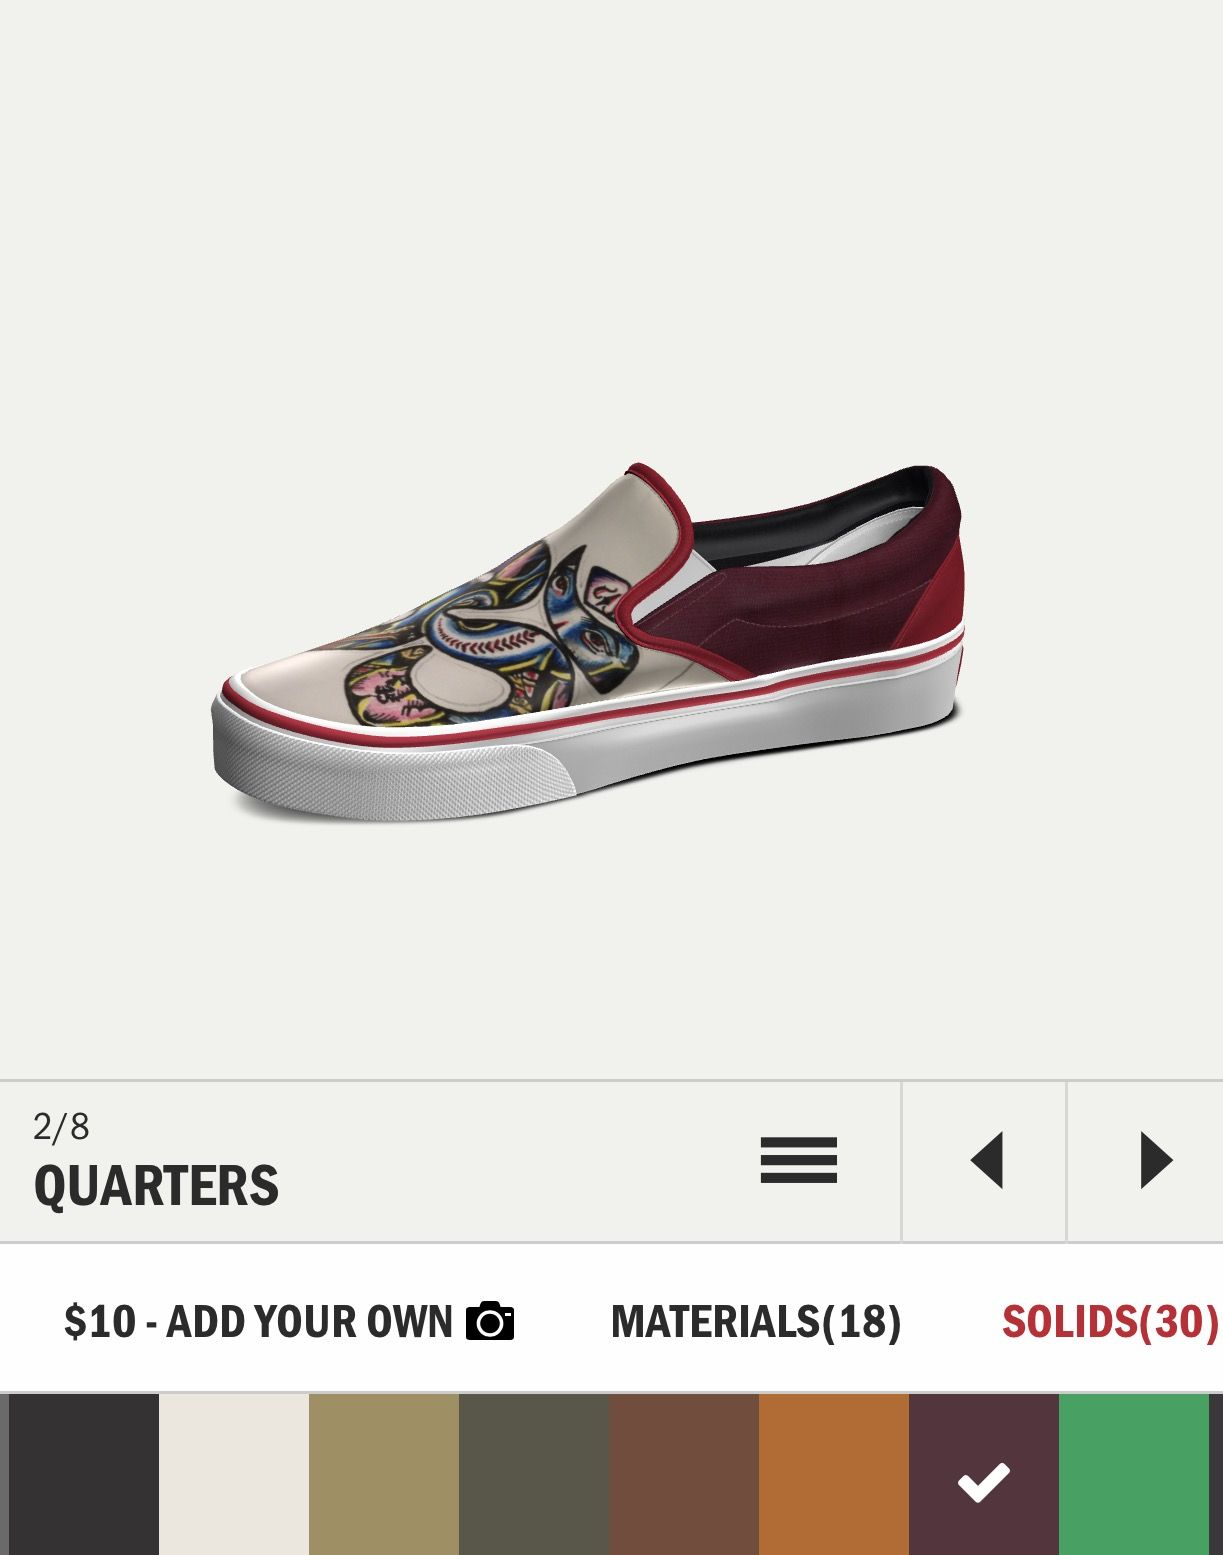 Pin by Owino Obado on Kiatugraphy | Vans shoes fashion